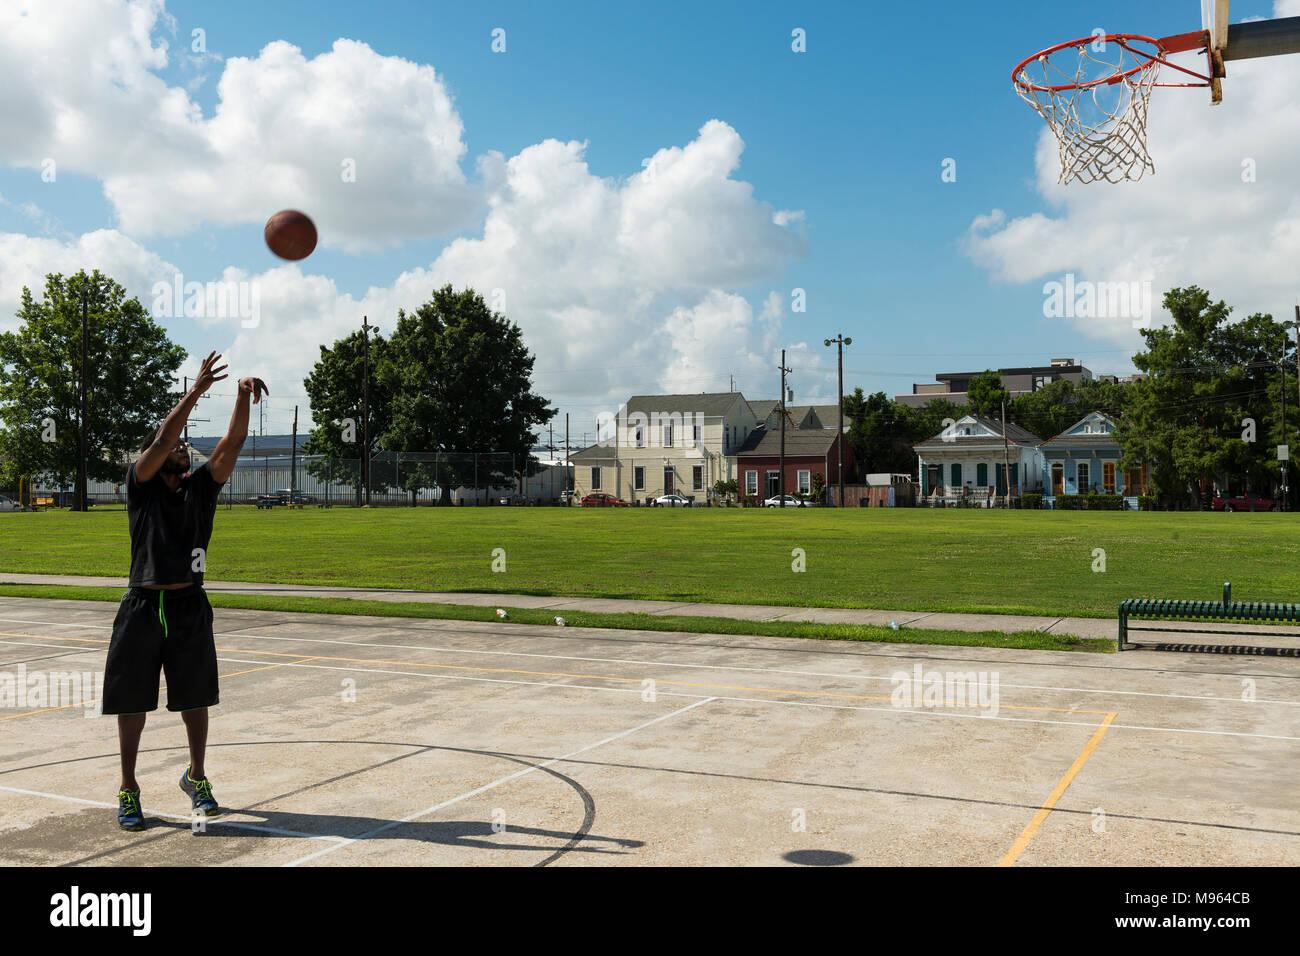 street basketball usa stock photos street basketball usa stock images alamy. Black Bedroom Furniture Sets. Home Design Ideas